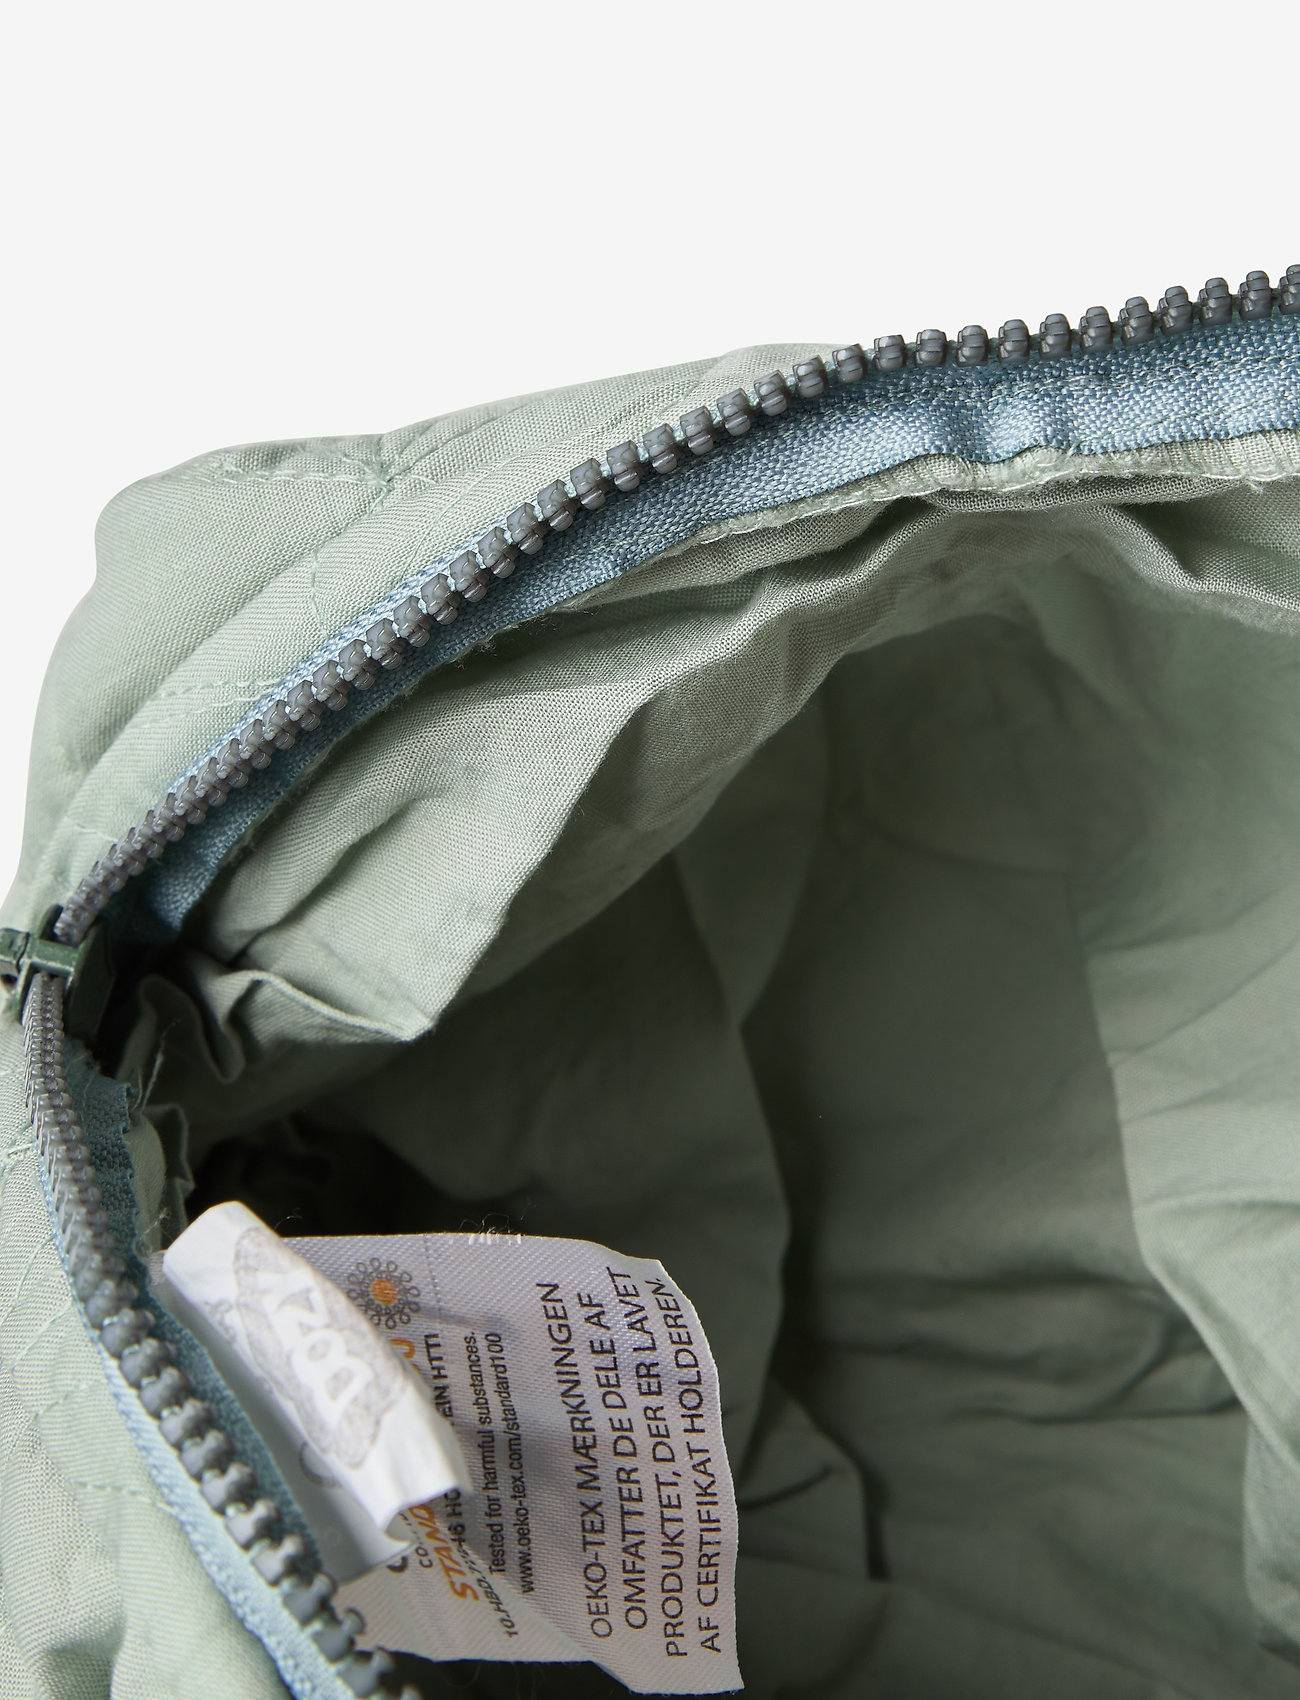 Cozy by Dozy - Cozy by Dozy Toiletry Bag - toiletry bags - green - 3